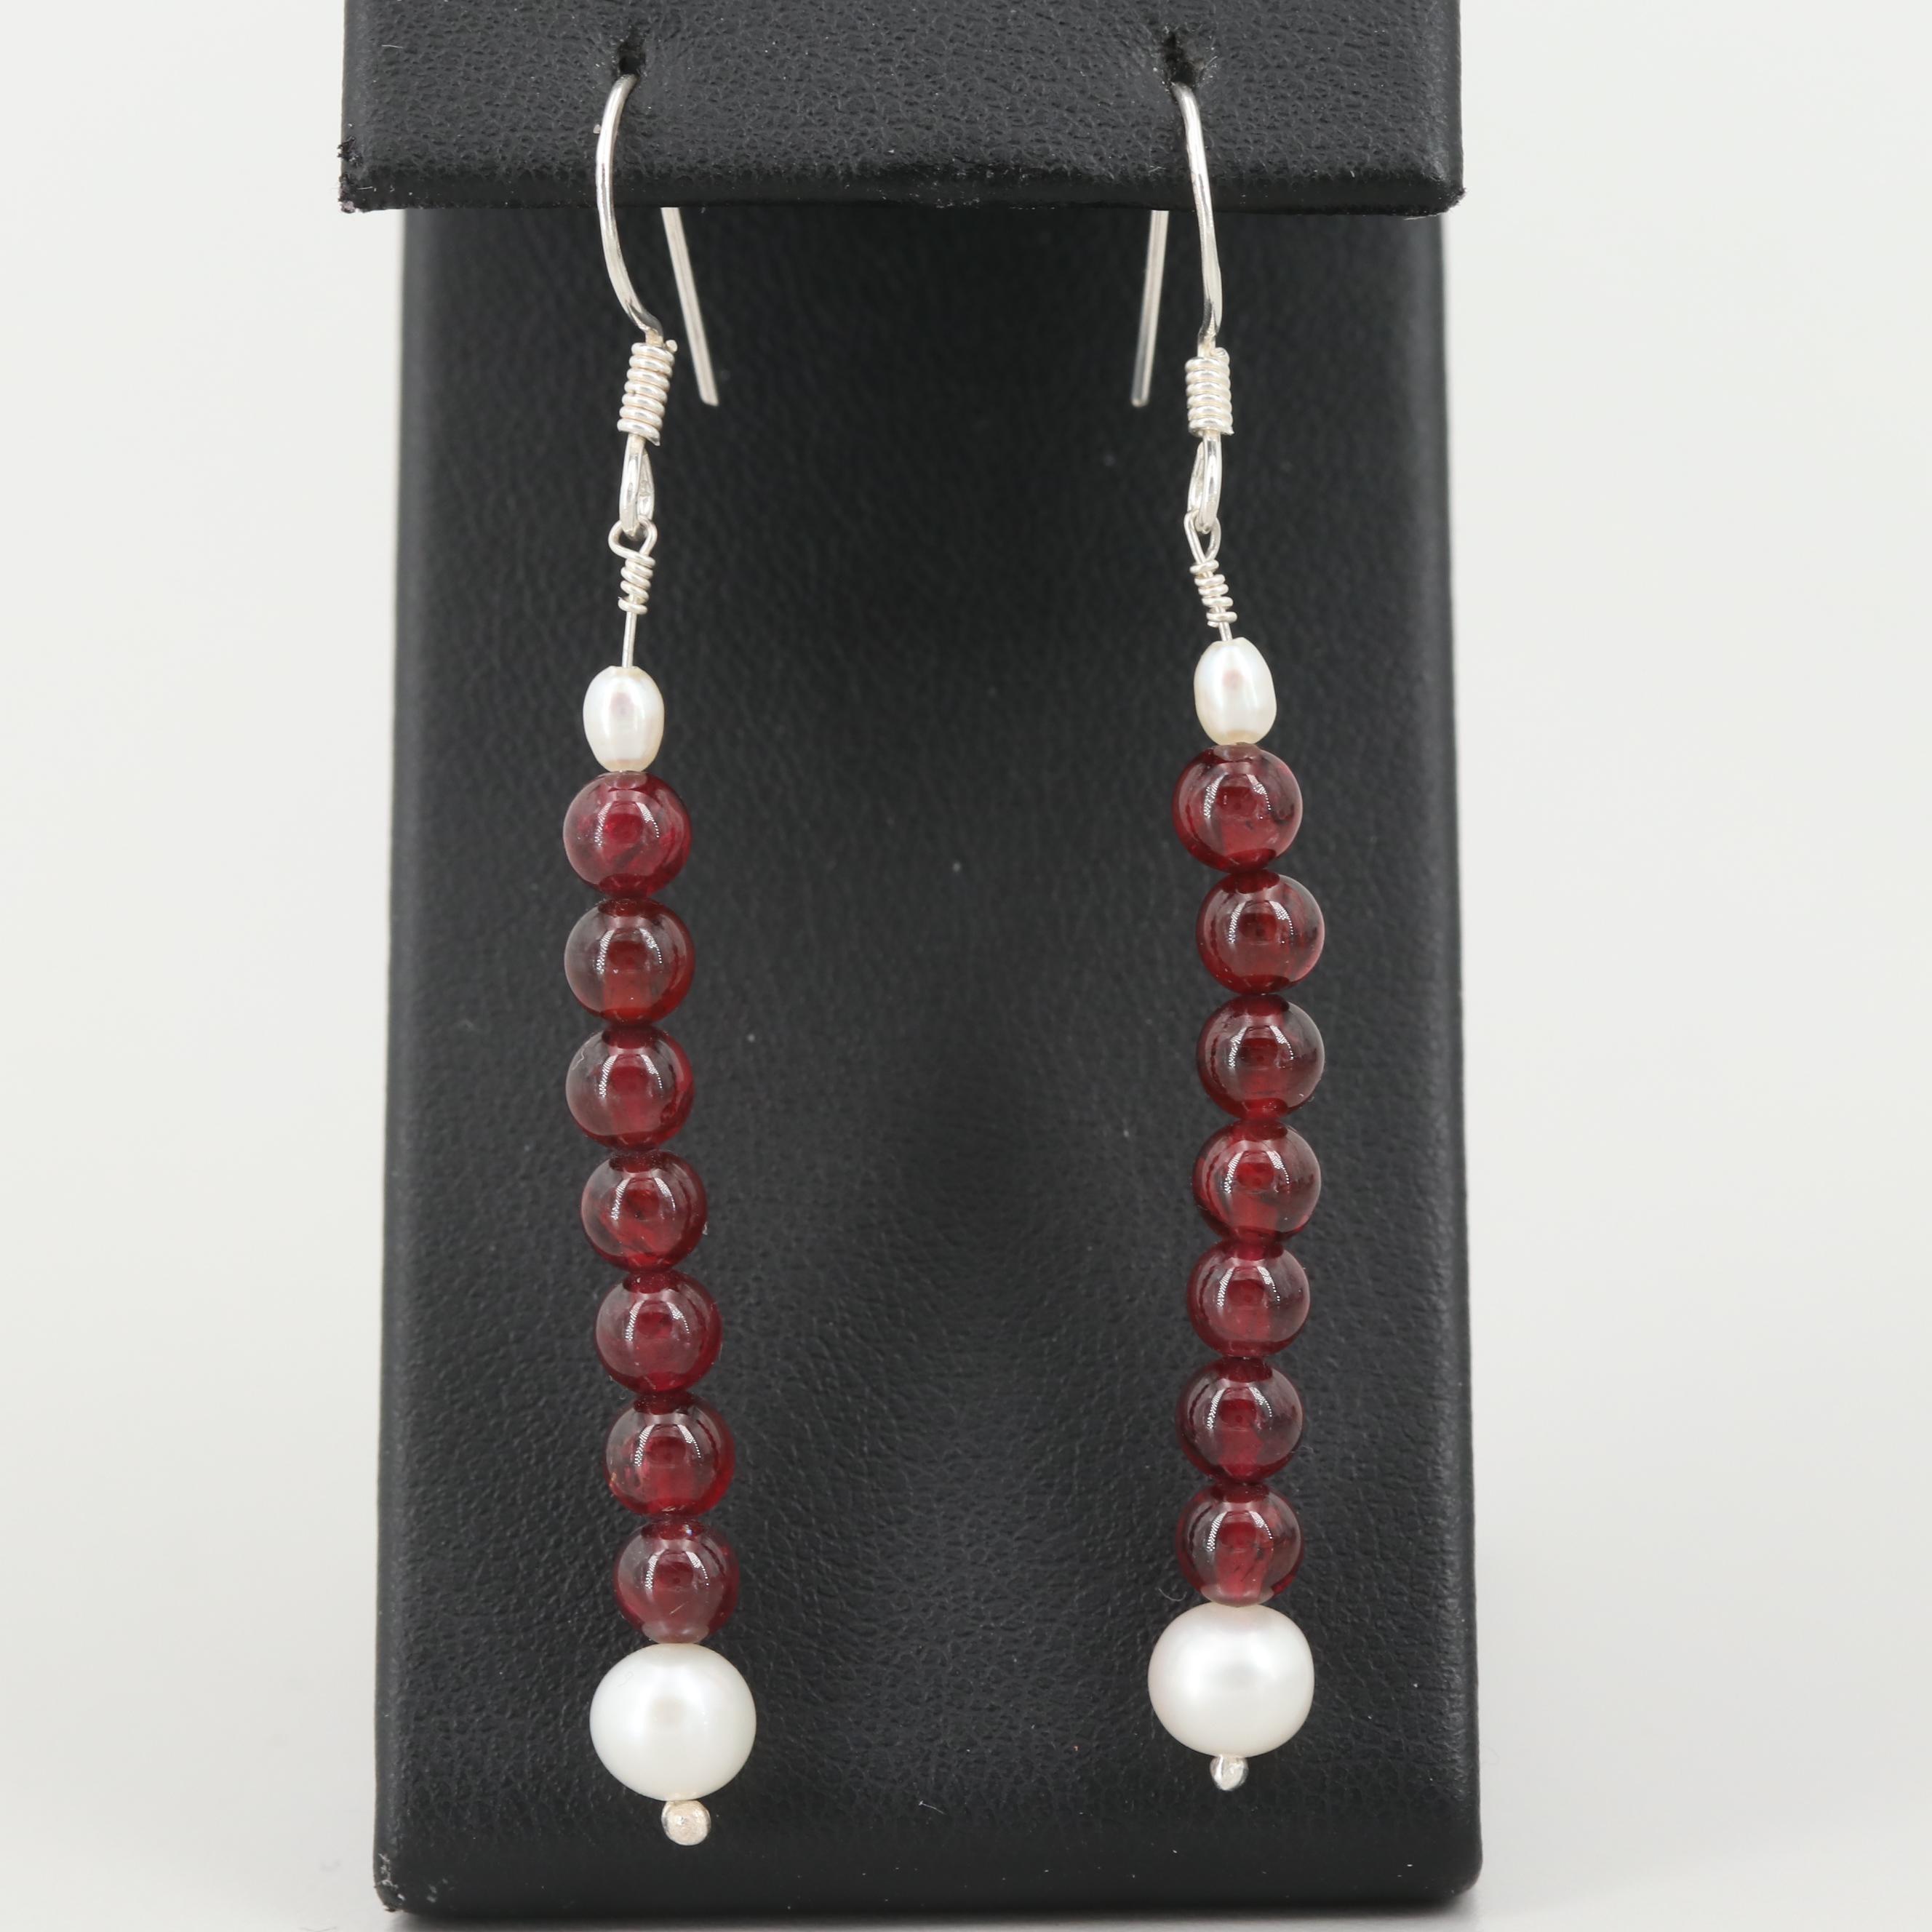 Sterling Silver Garnet and Cultured Pearl Earrings